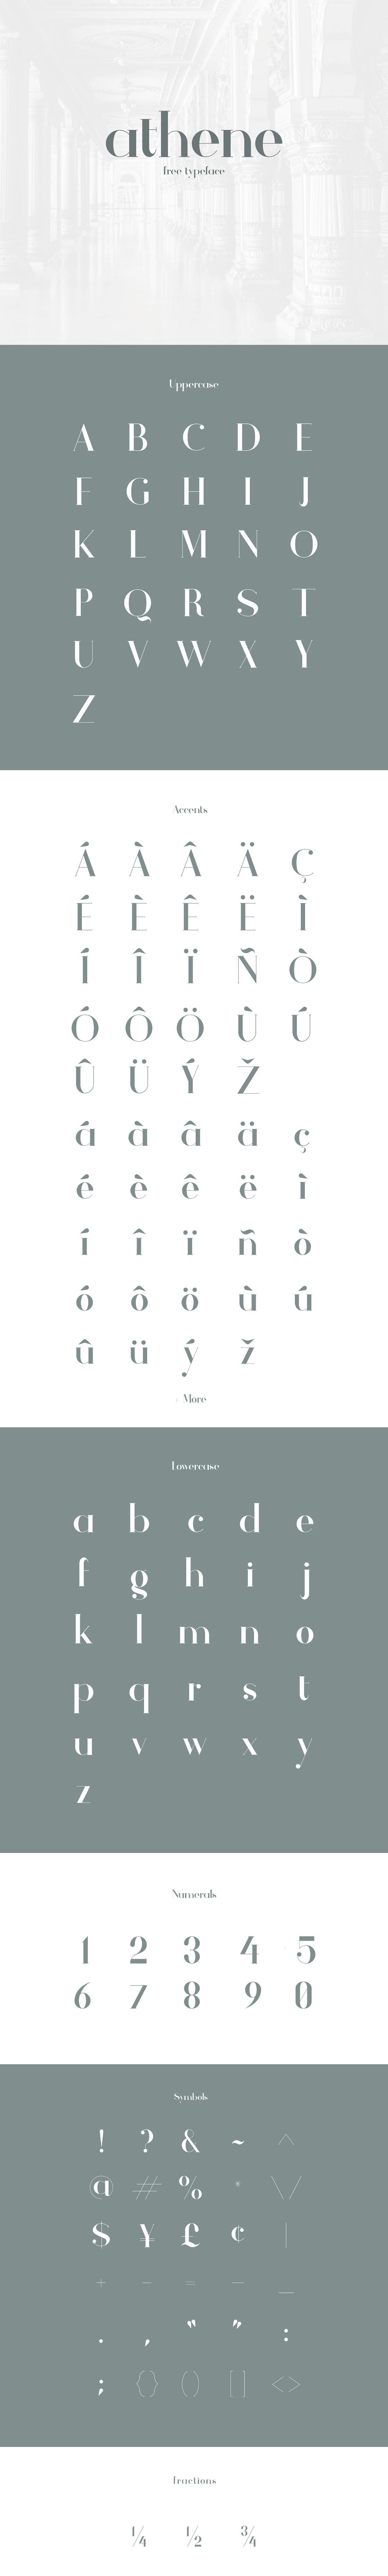 Athene Font Free - Dafont Free